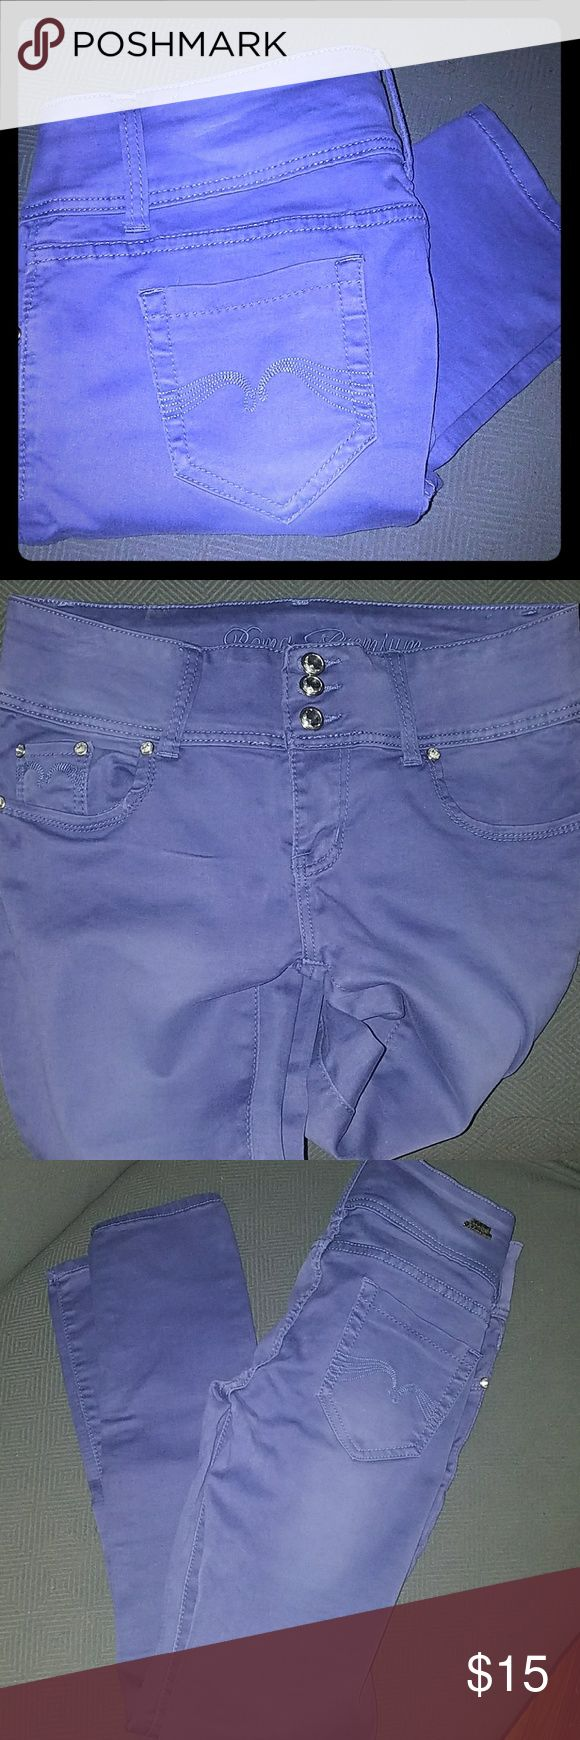 Purple Skinny Jeans Size 11 Purple skinny jeans by Roma Premium. 3 button stretchy. Roma Premium Pants Skinny